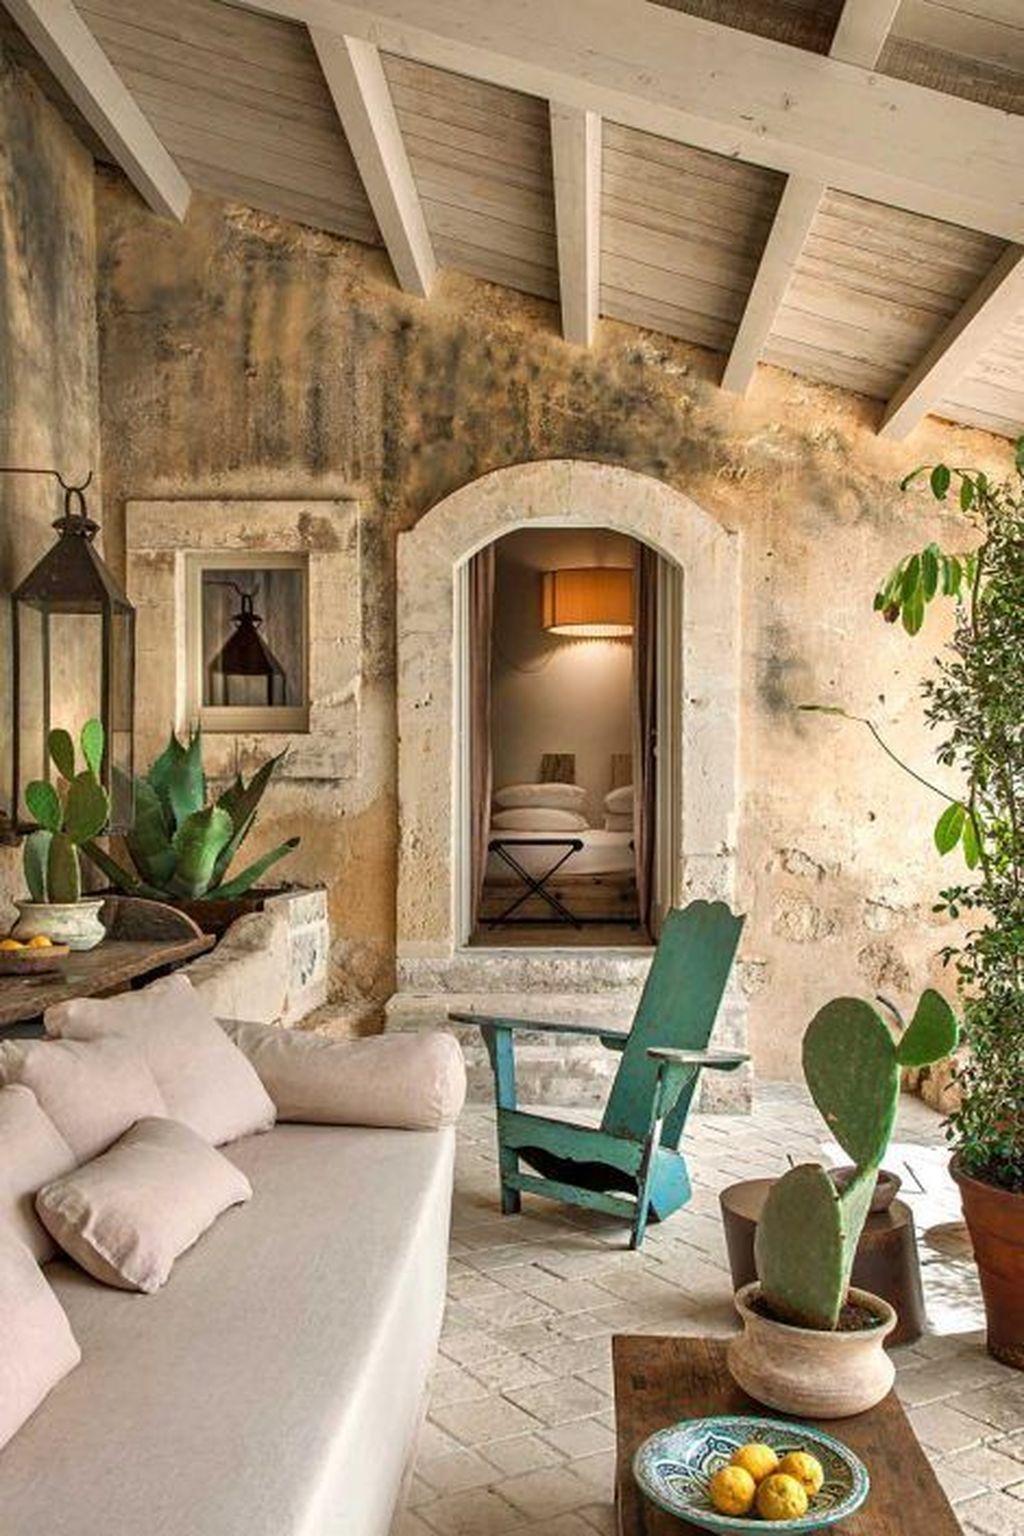 32 Stunning Italian Rustic Decor Ideas For Your Living Room